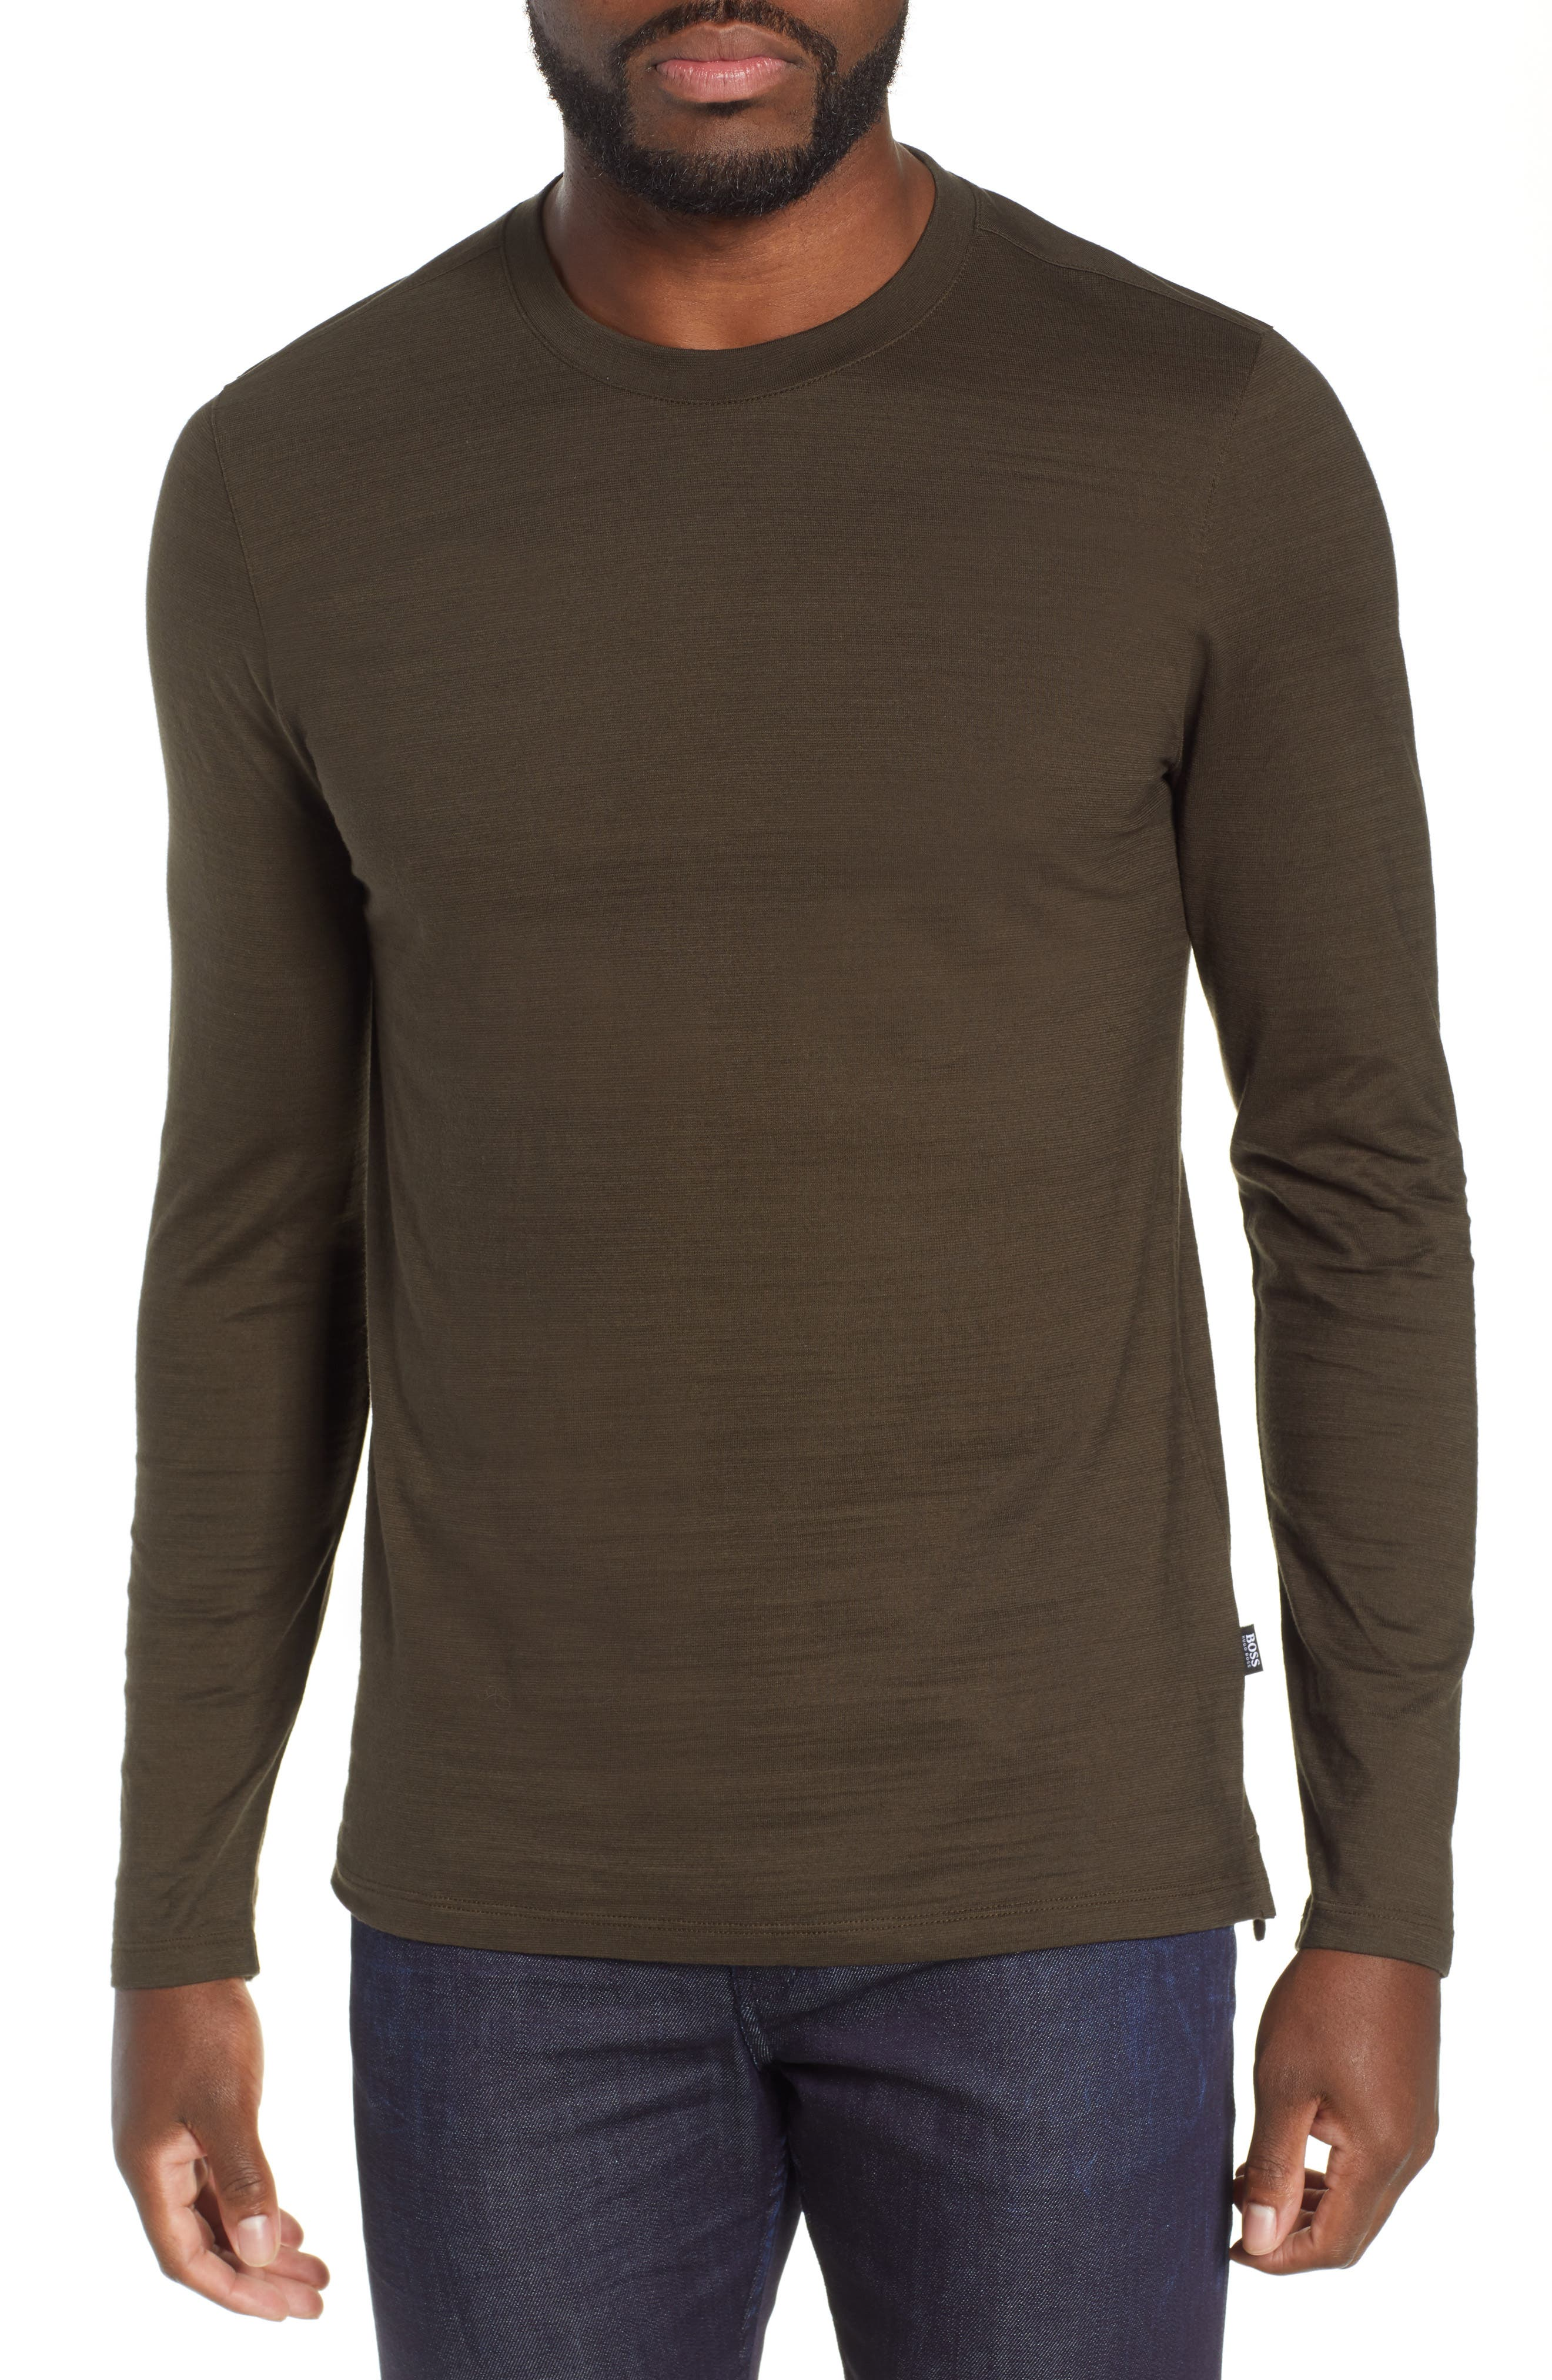 Tenison Long Sleeve Crewneck T-Shirt,                             Main thumbnail 1, color,                             DARK GREEN